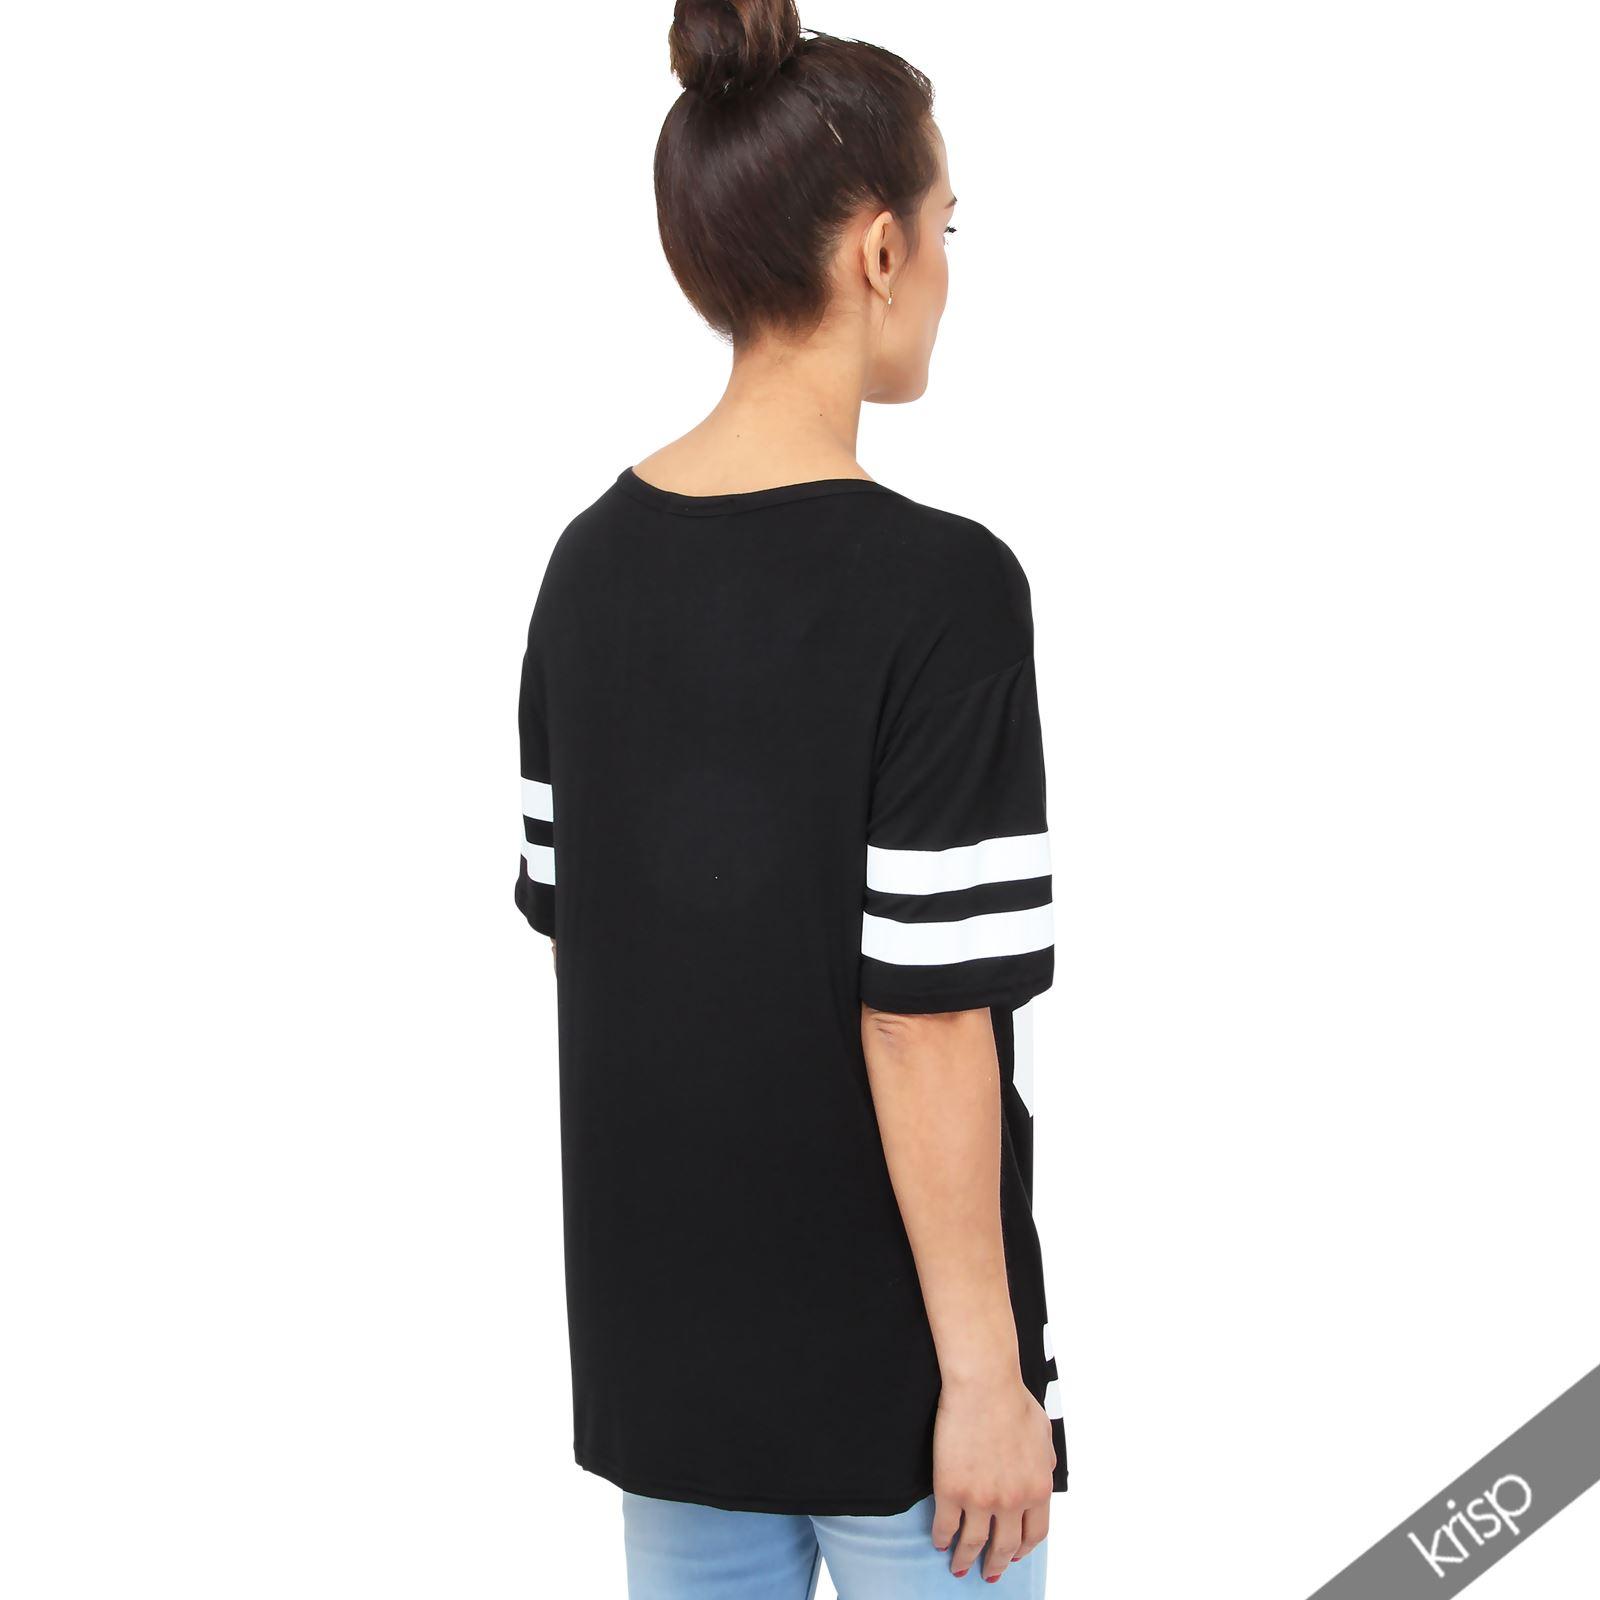 damen t shirt nummer 93 oversize baseball top american college top plus size ebay. Black Bedroom Furniture Sets. Home Design Ideas